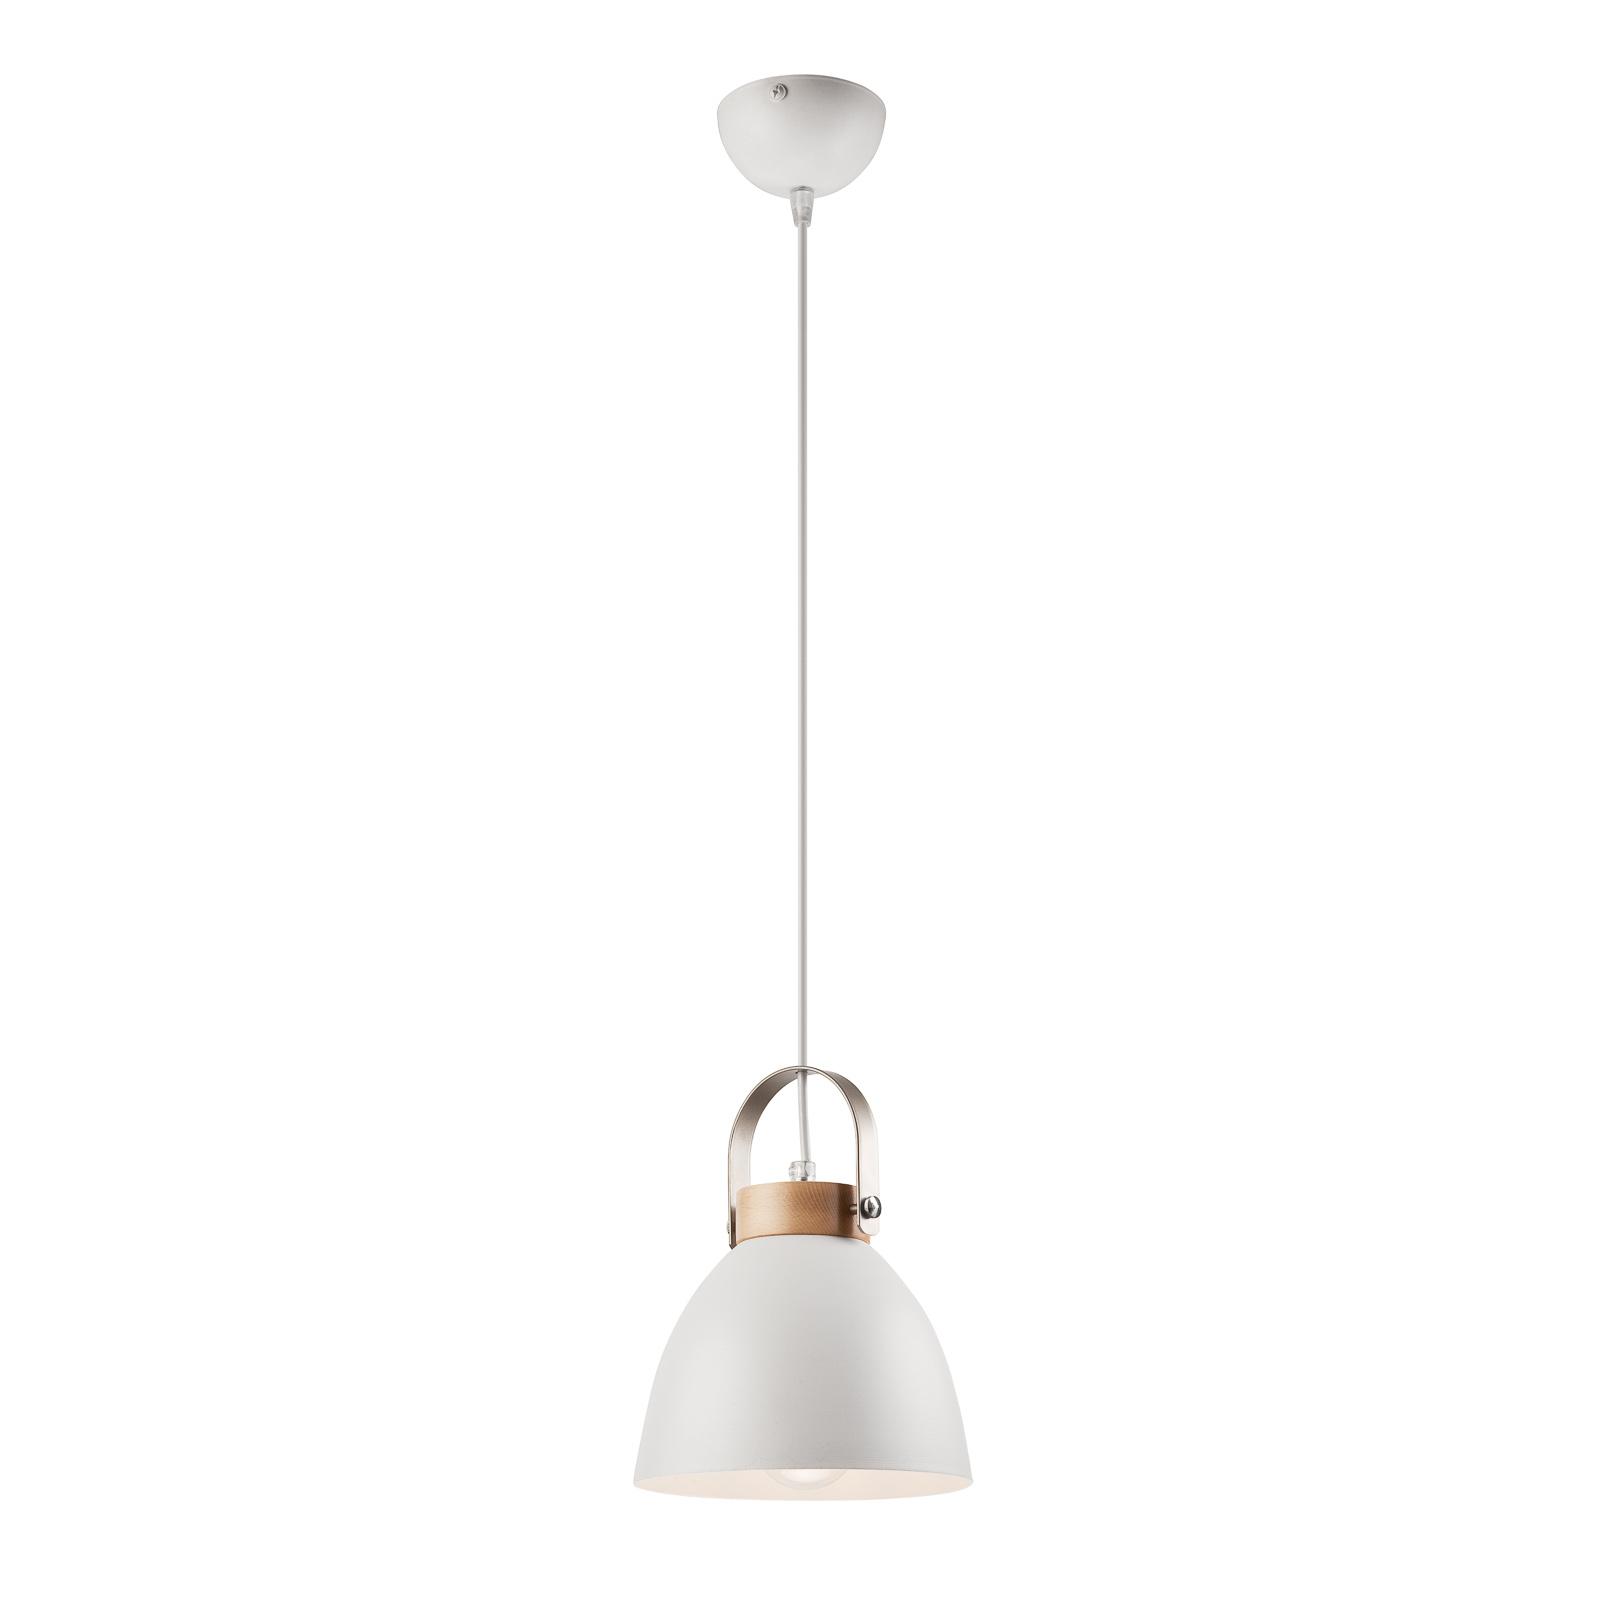 Lampa wisząca Bergen, 1-punktowa, biała